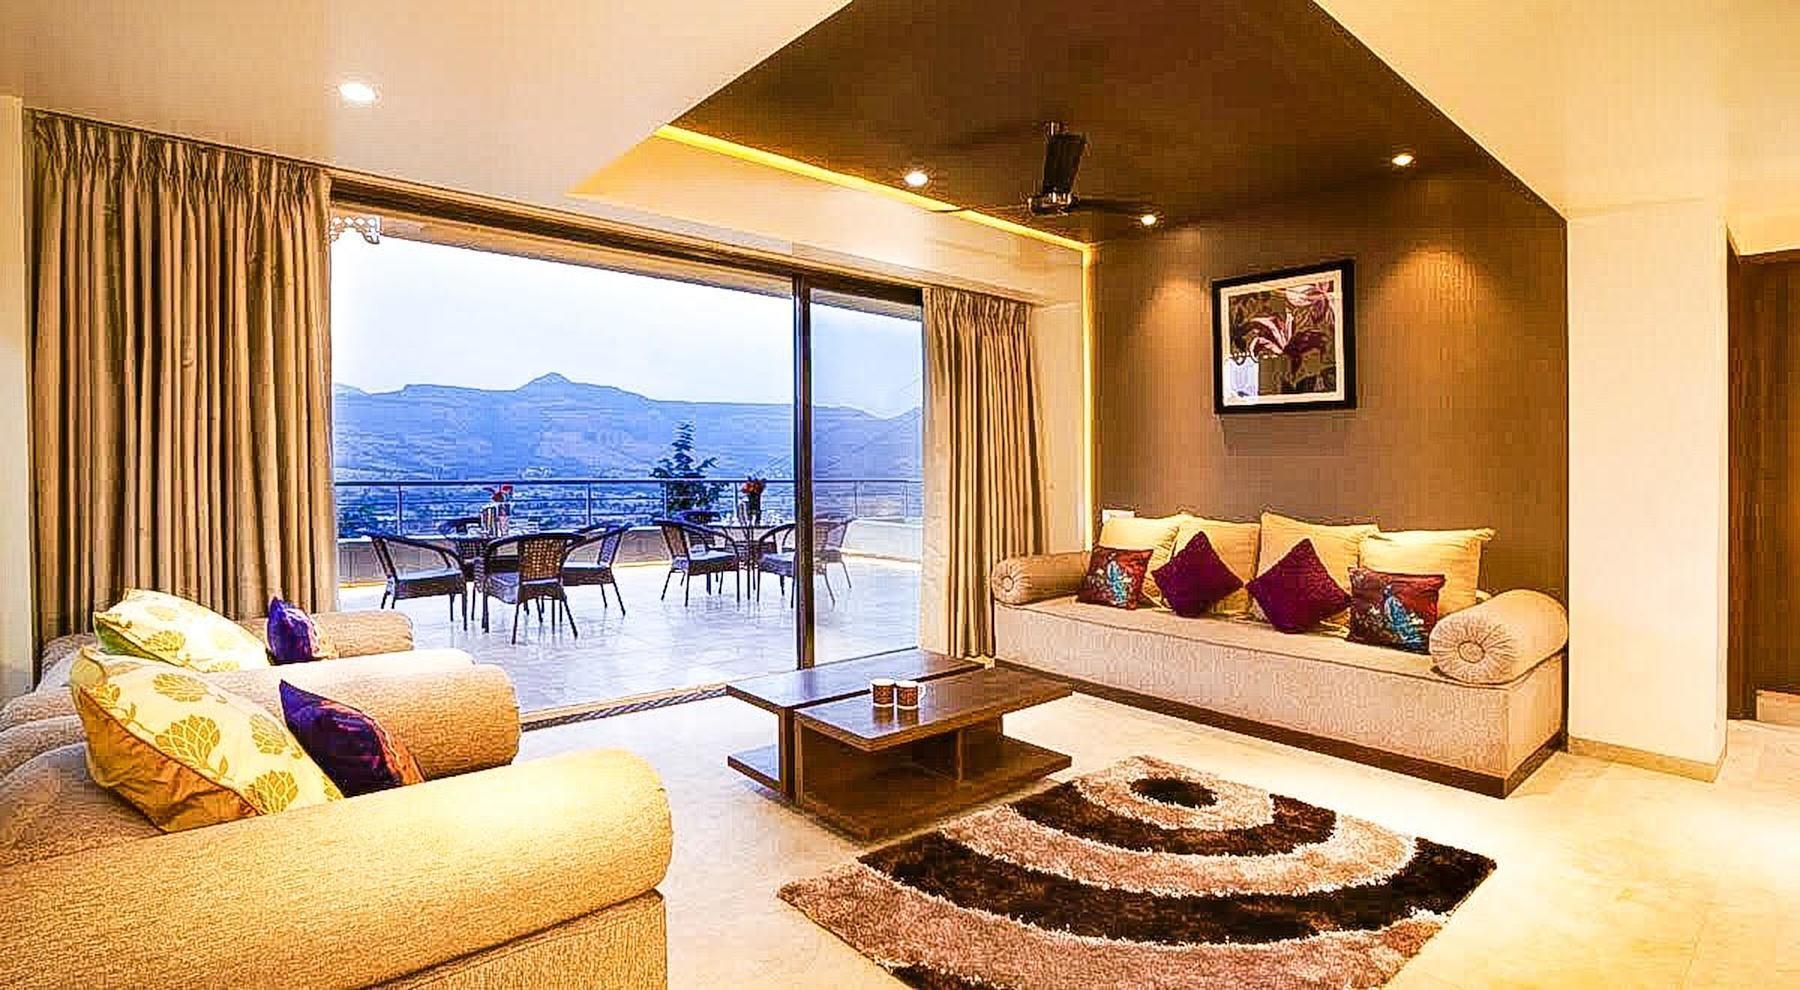 Mrudugandh Villa With Mountain Views